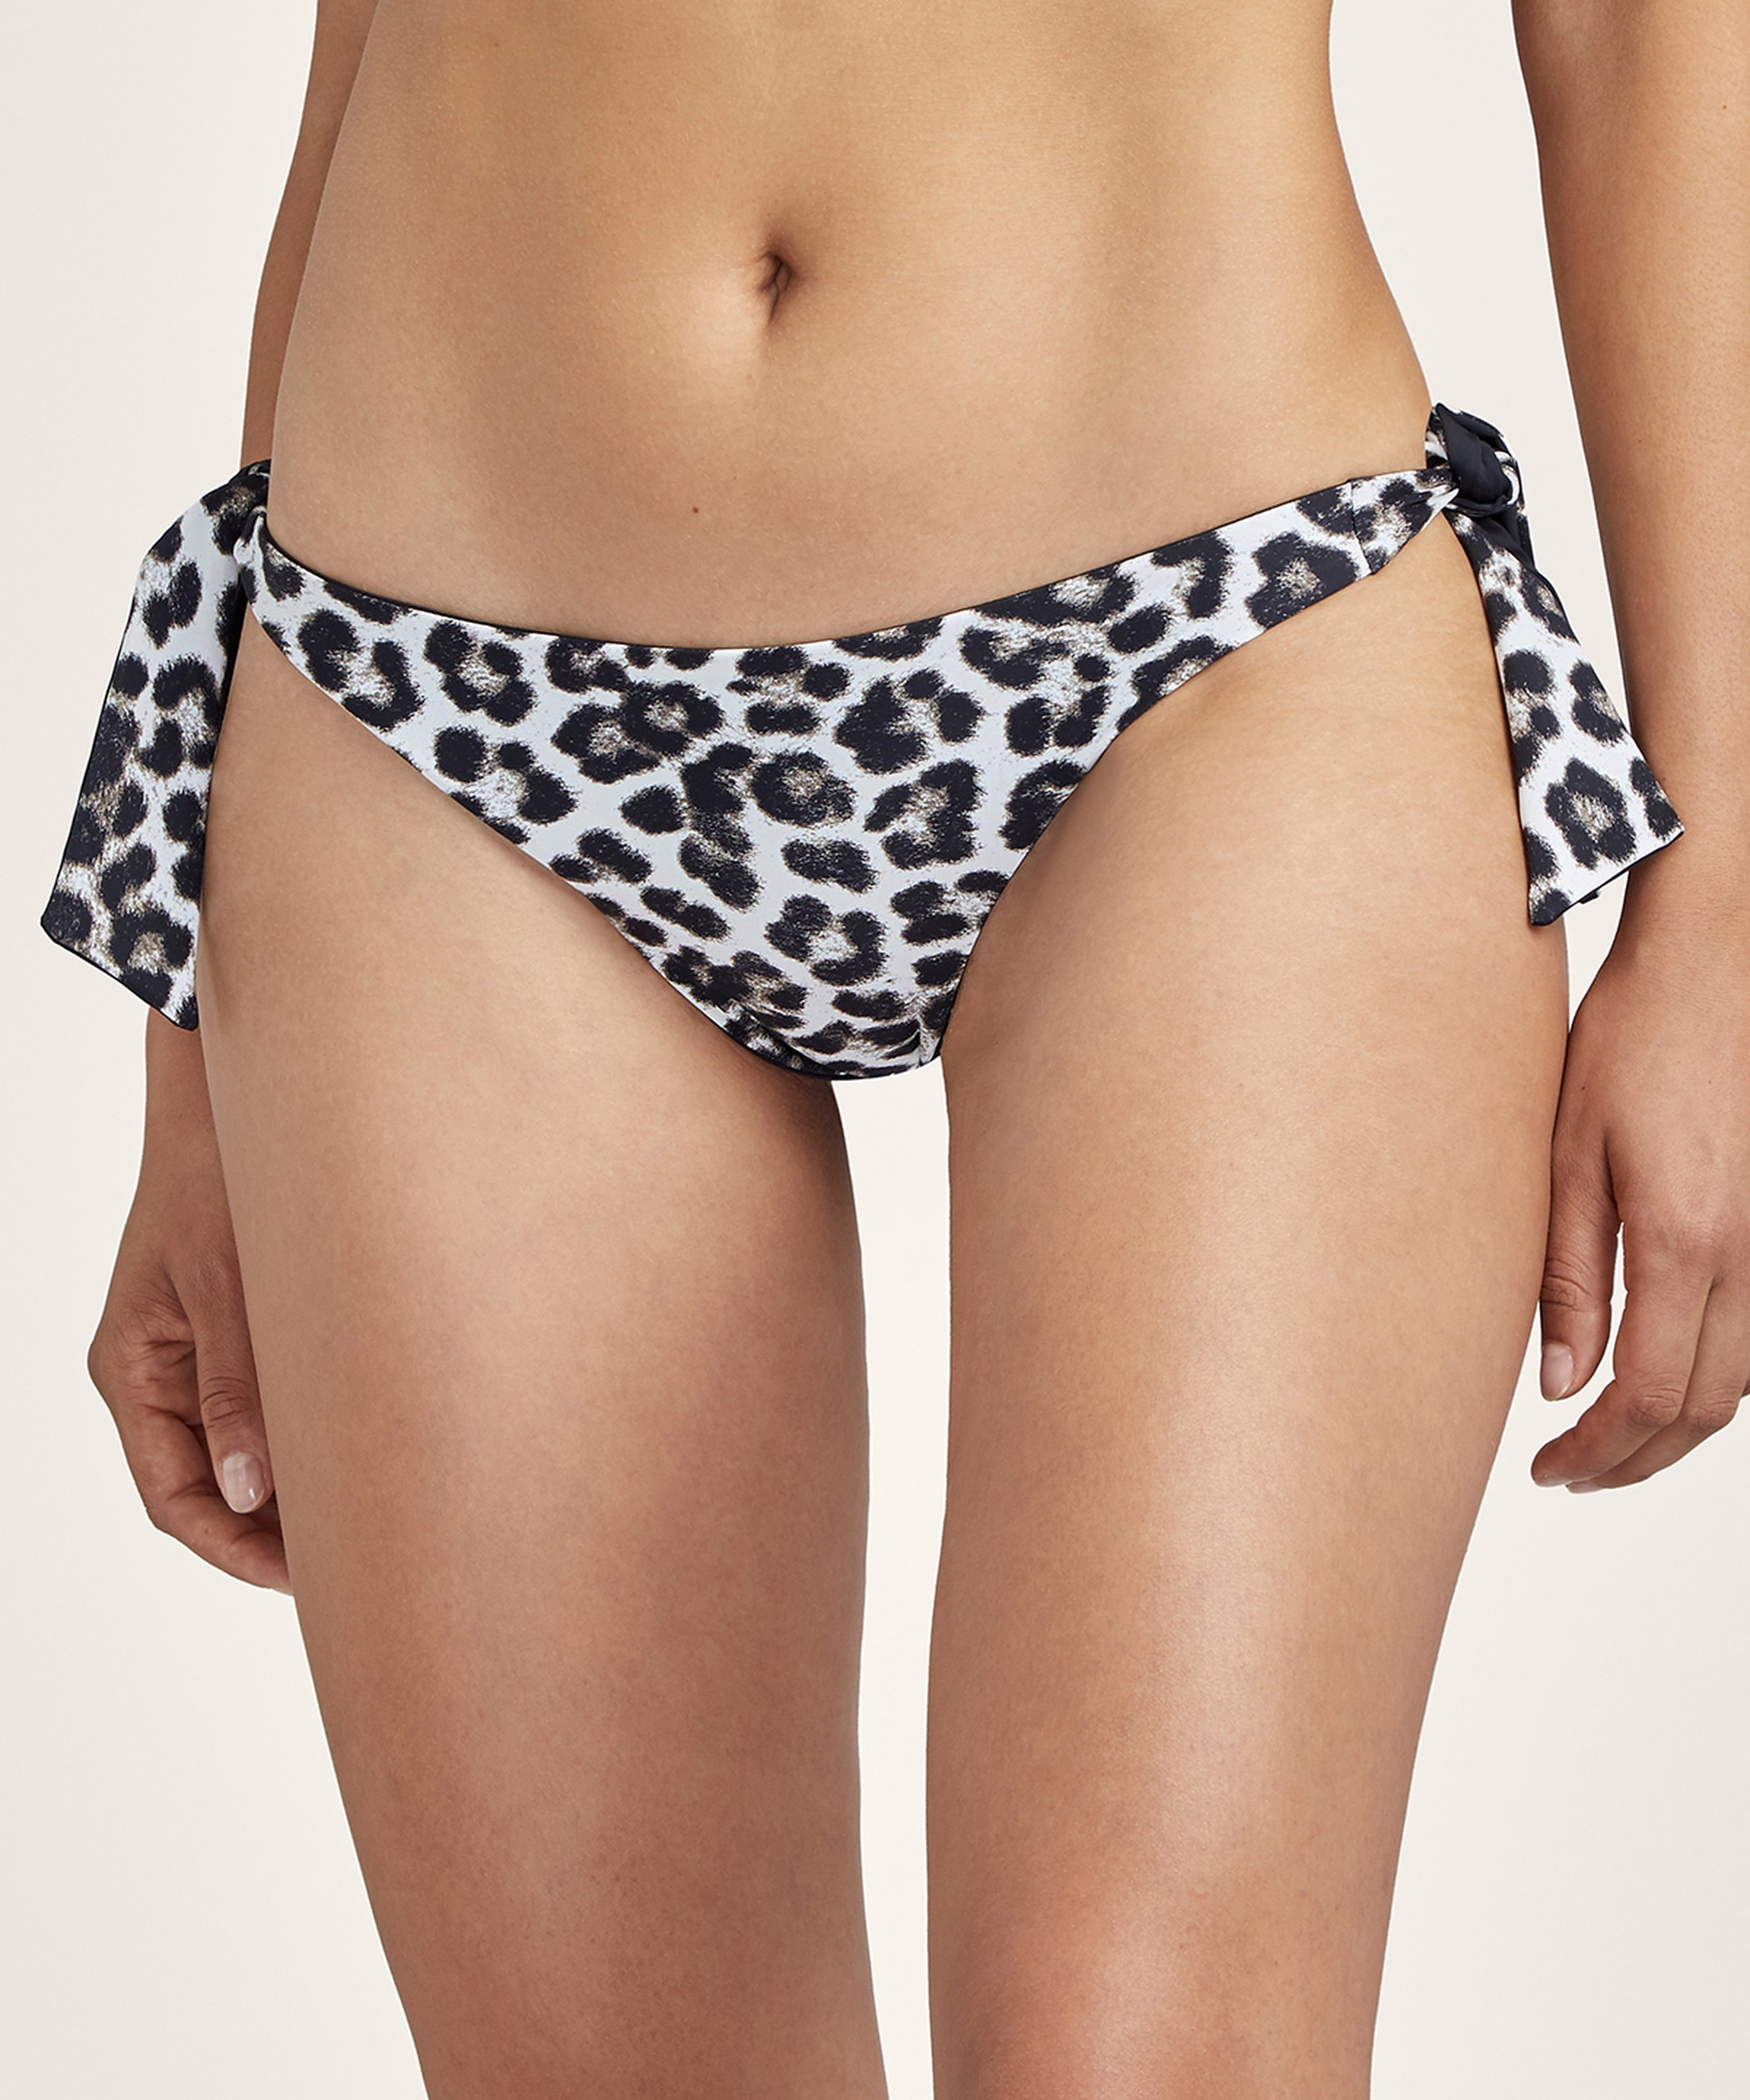 PEAU SAUVAGE Mini-coeur bikini bottom Panthère Brown | Aubade